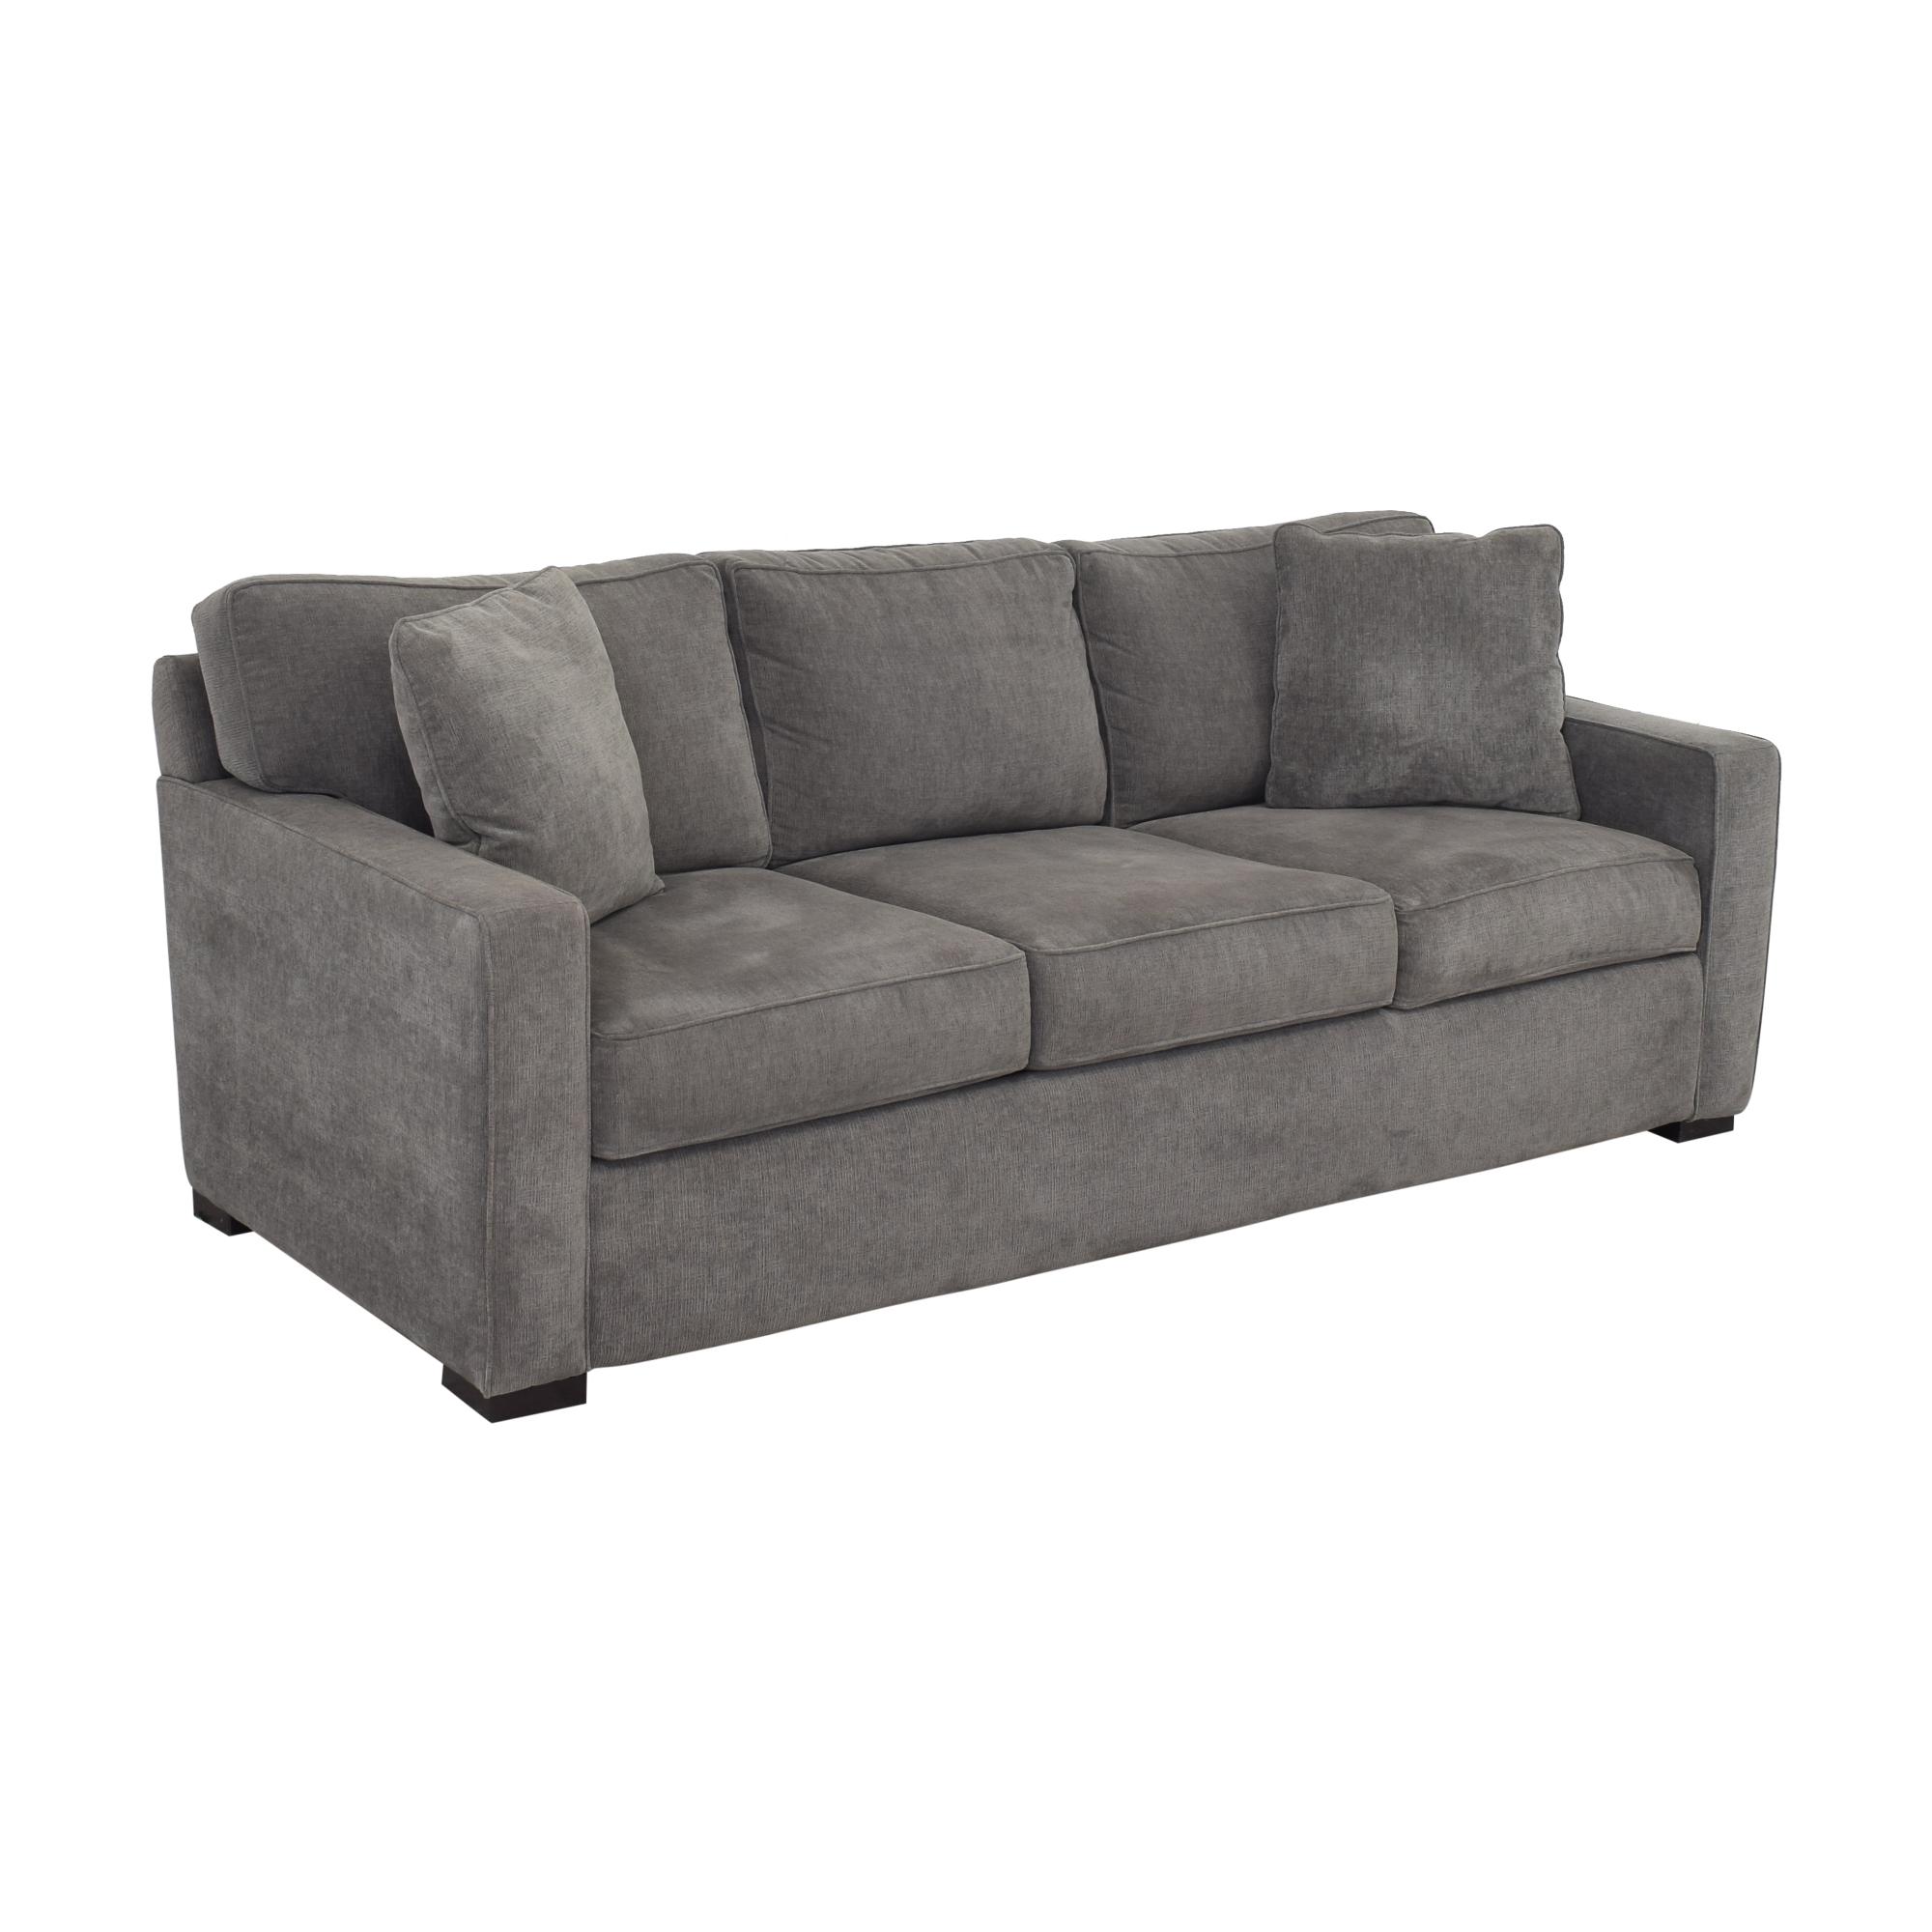 shop Macy's Radley Fabric Sofa Macy's Classic Sofas